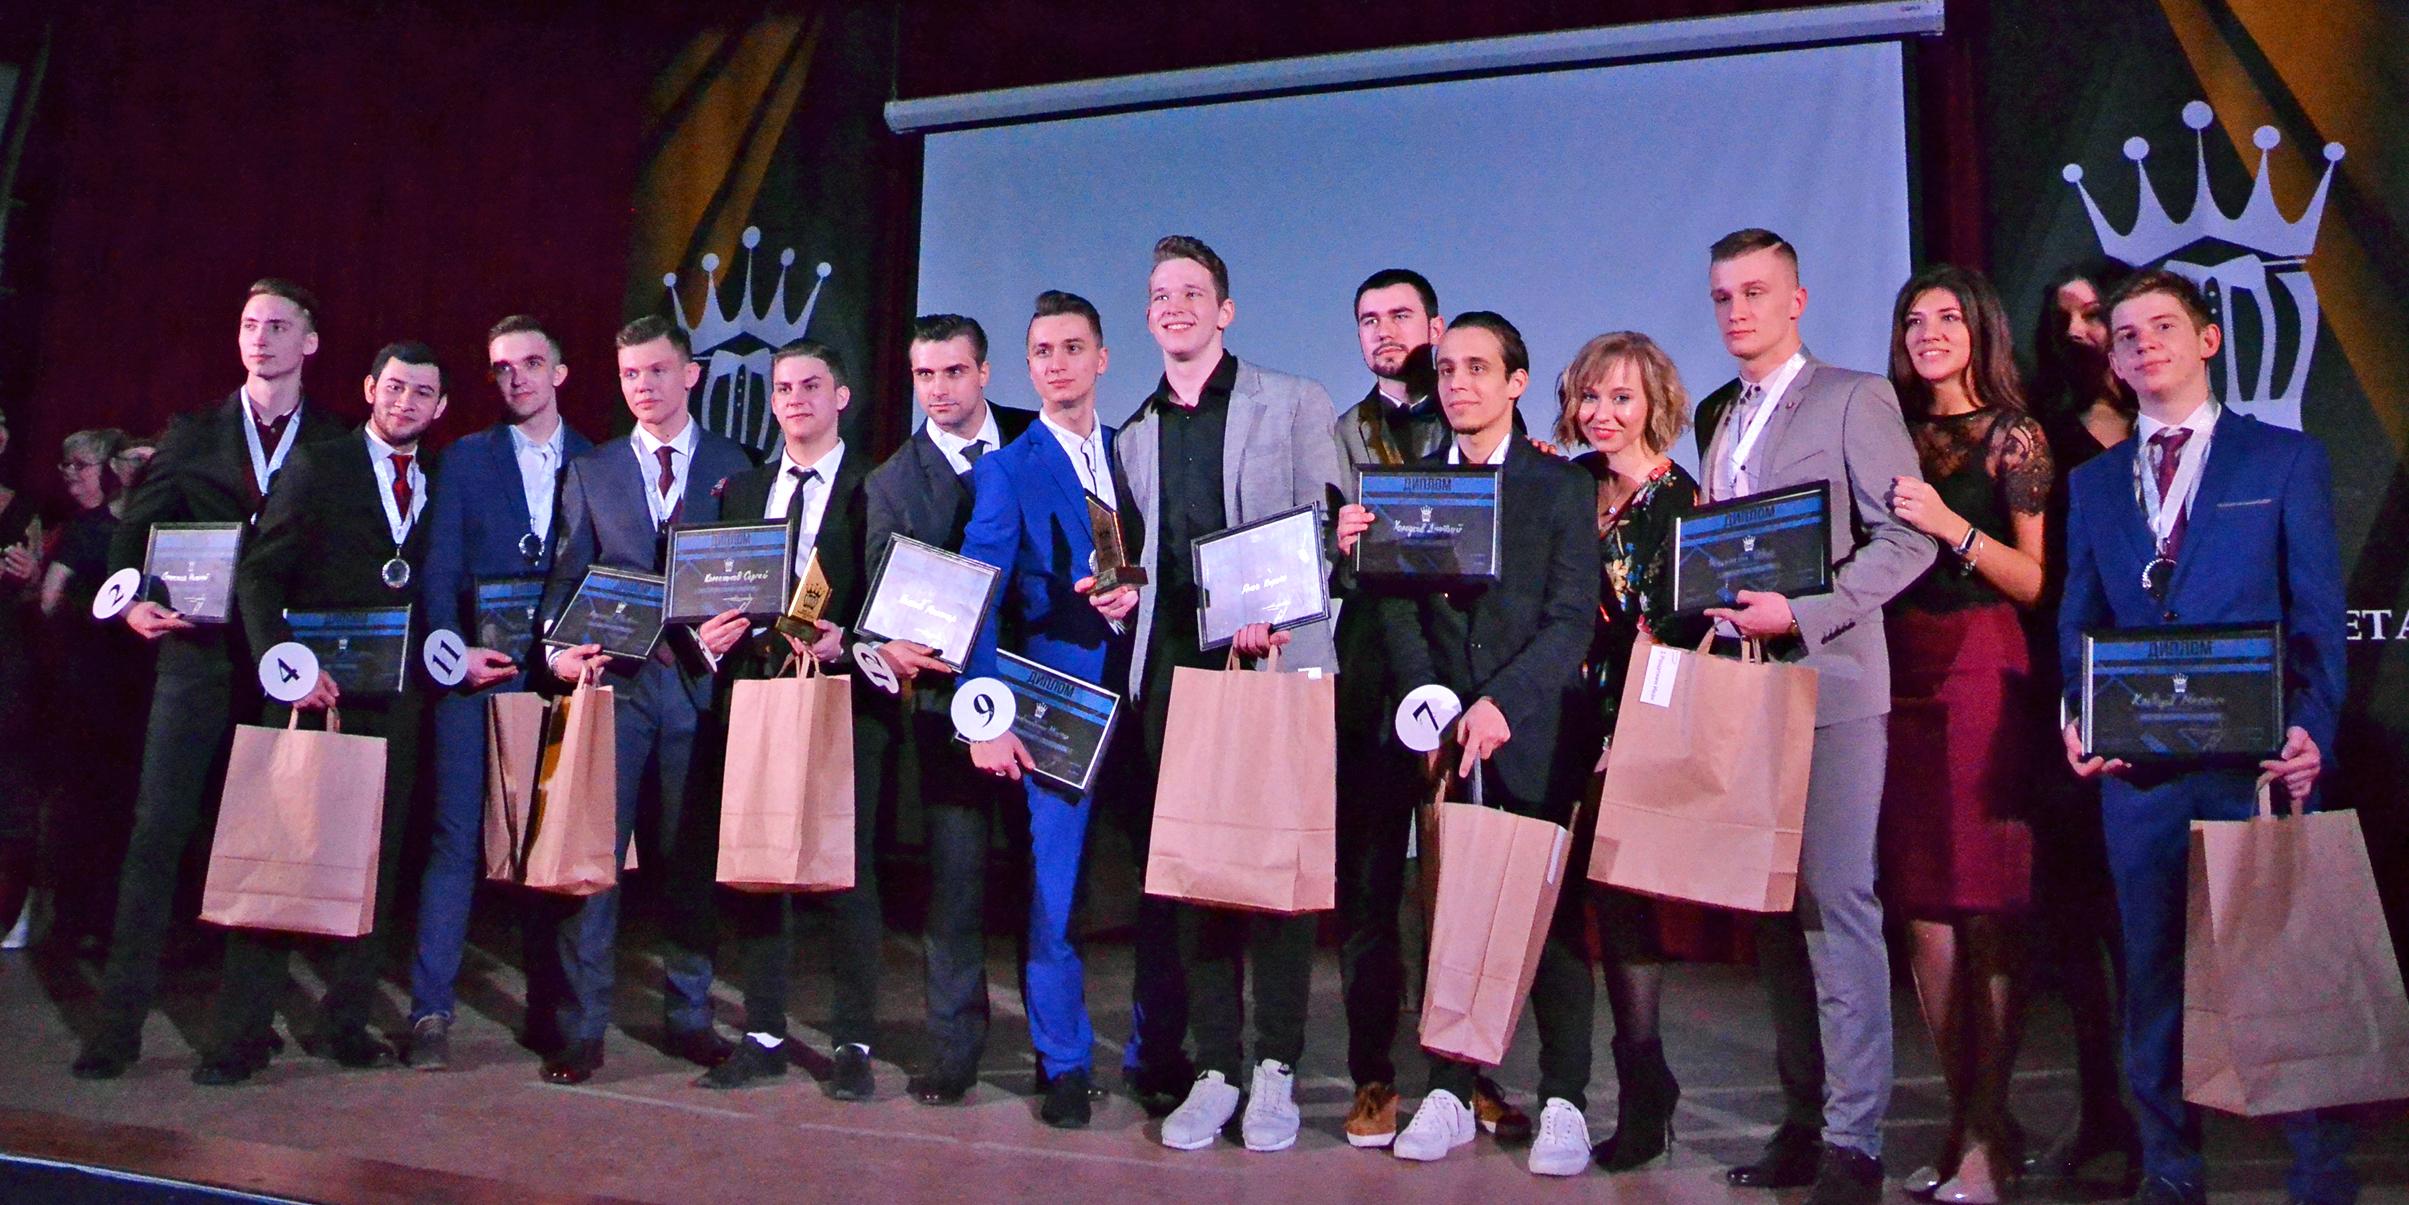 В Воронежском опорном вузе прошёл конкурс «Мистер Университета»